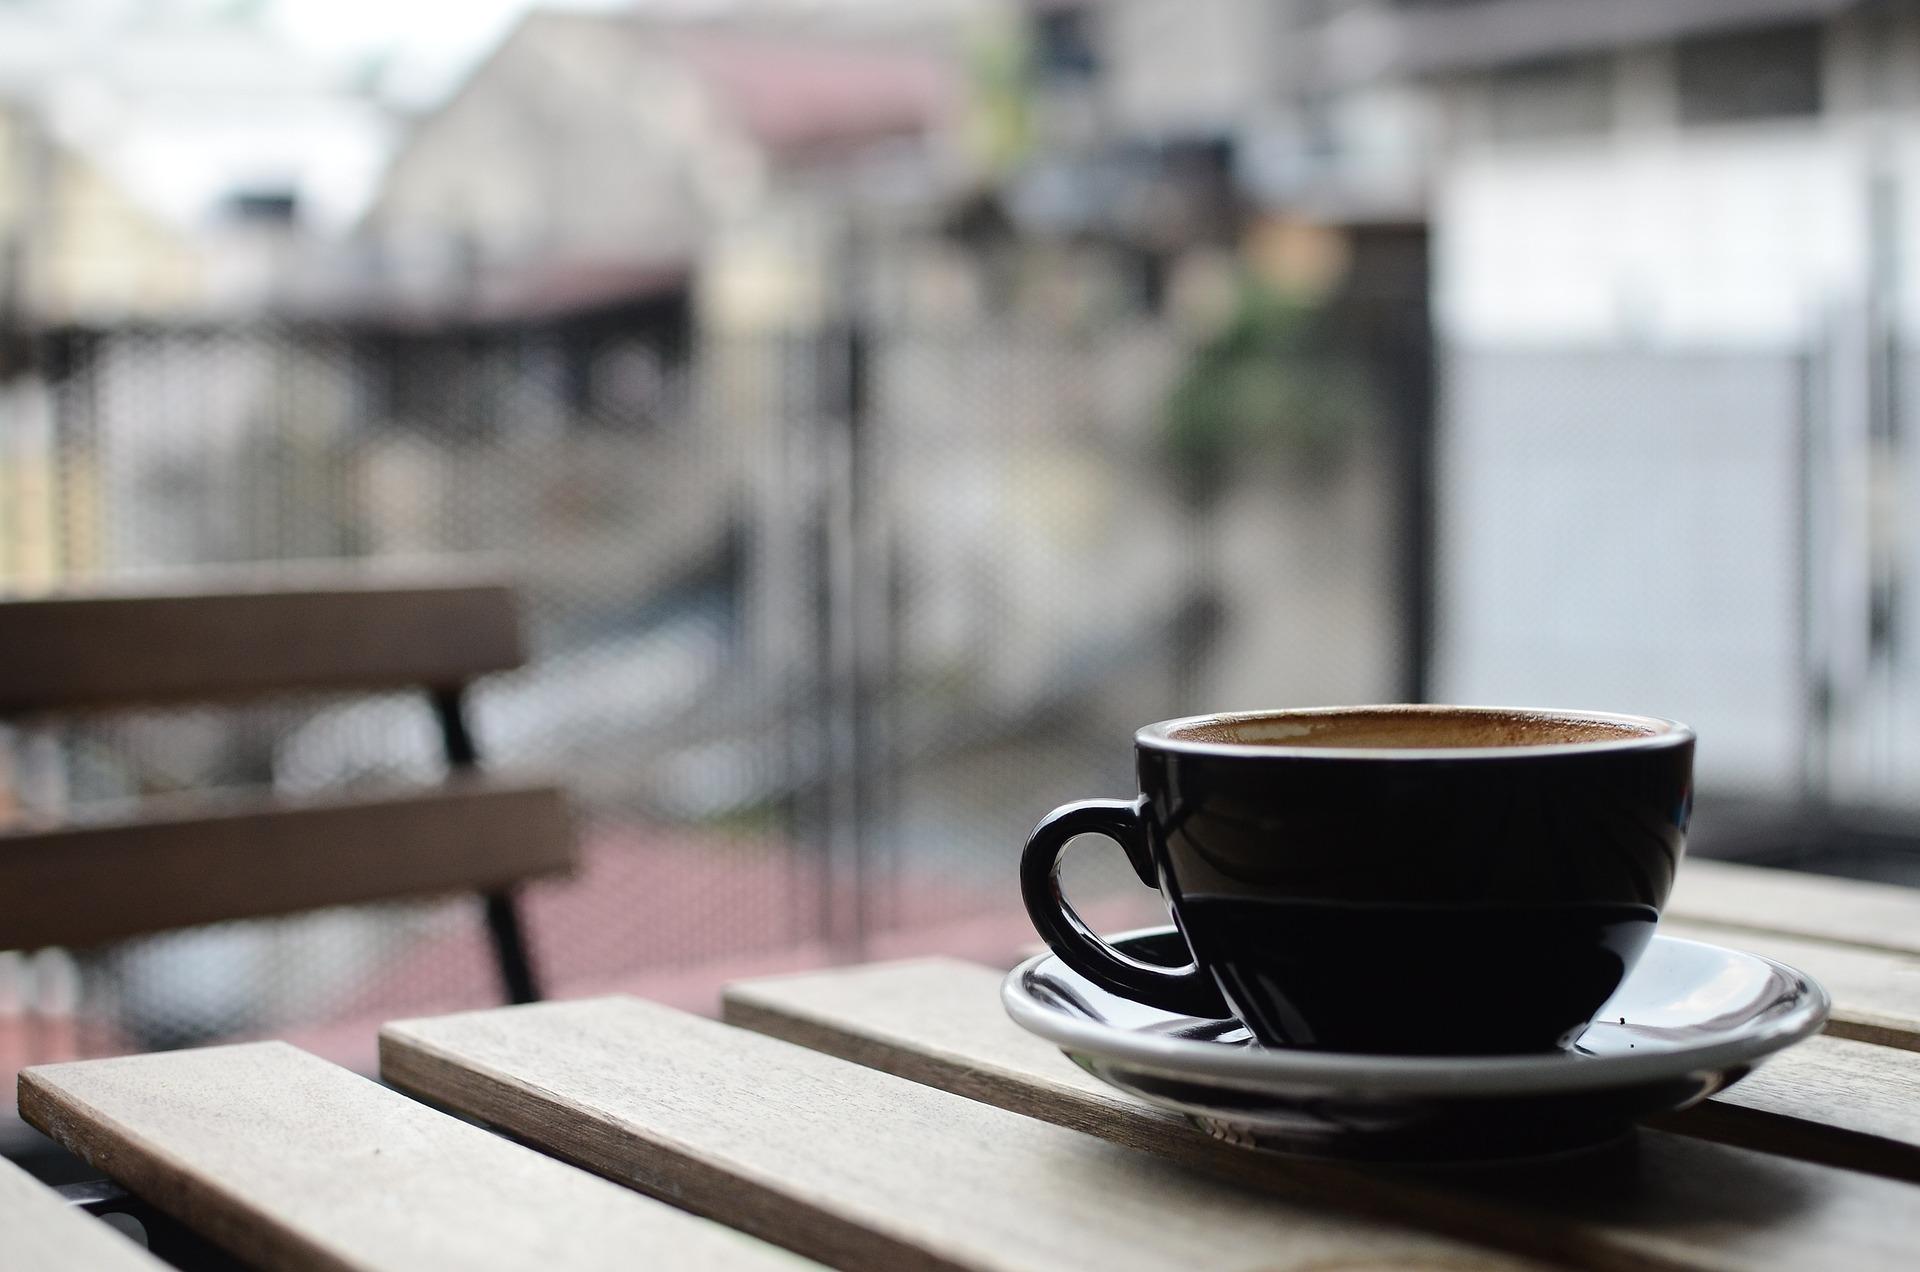 Ich geh dann mal ins Kaffee